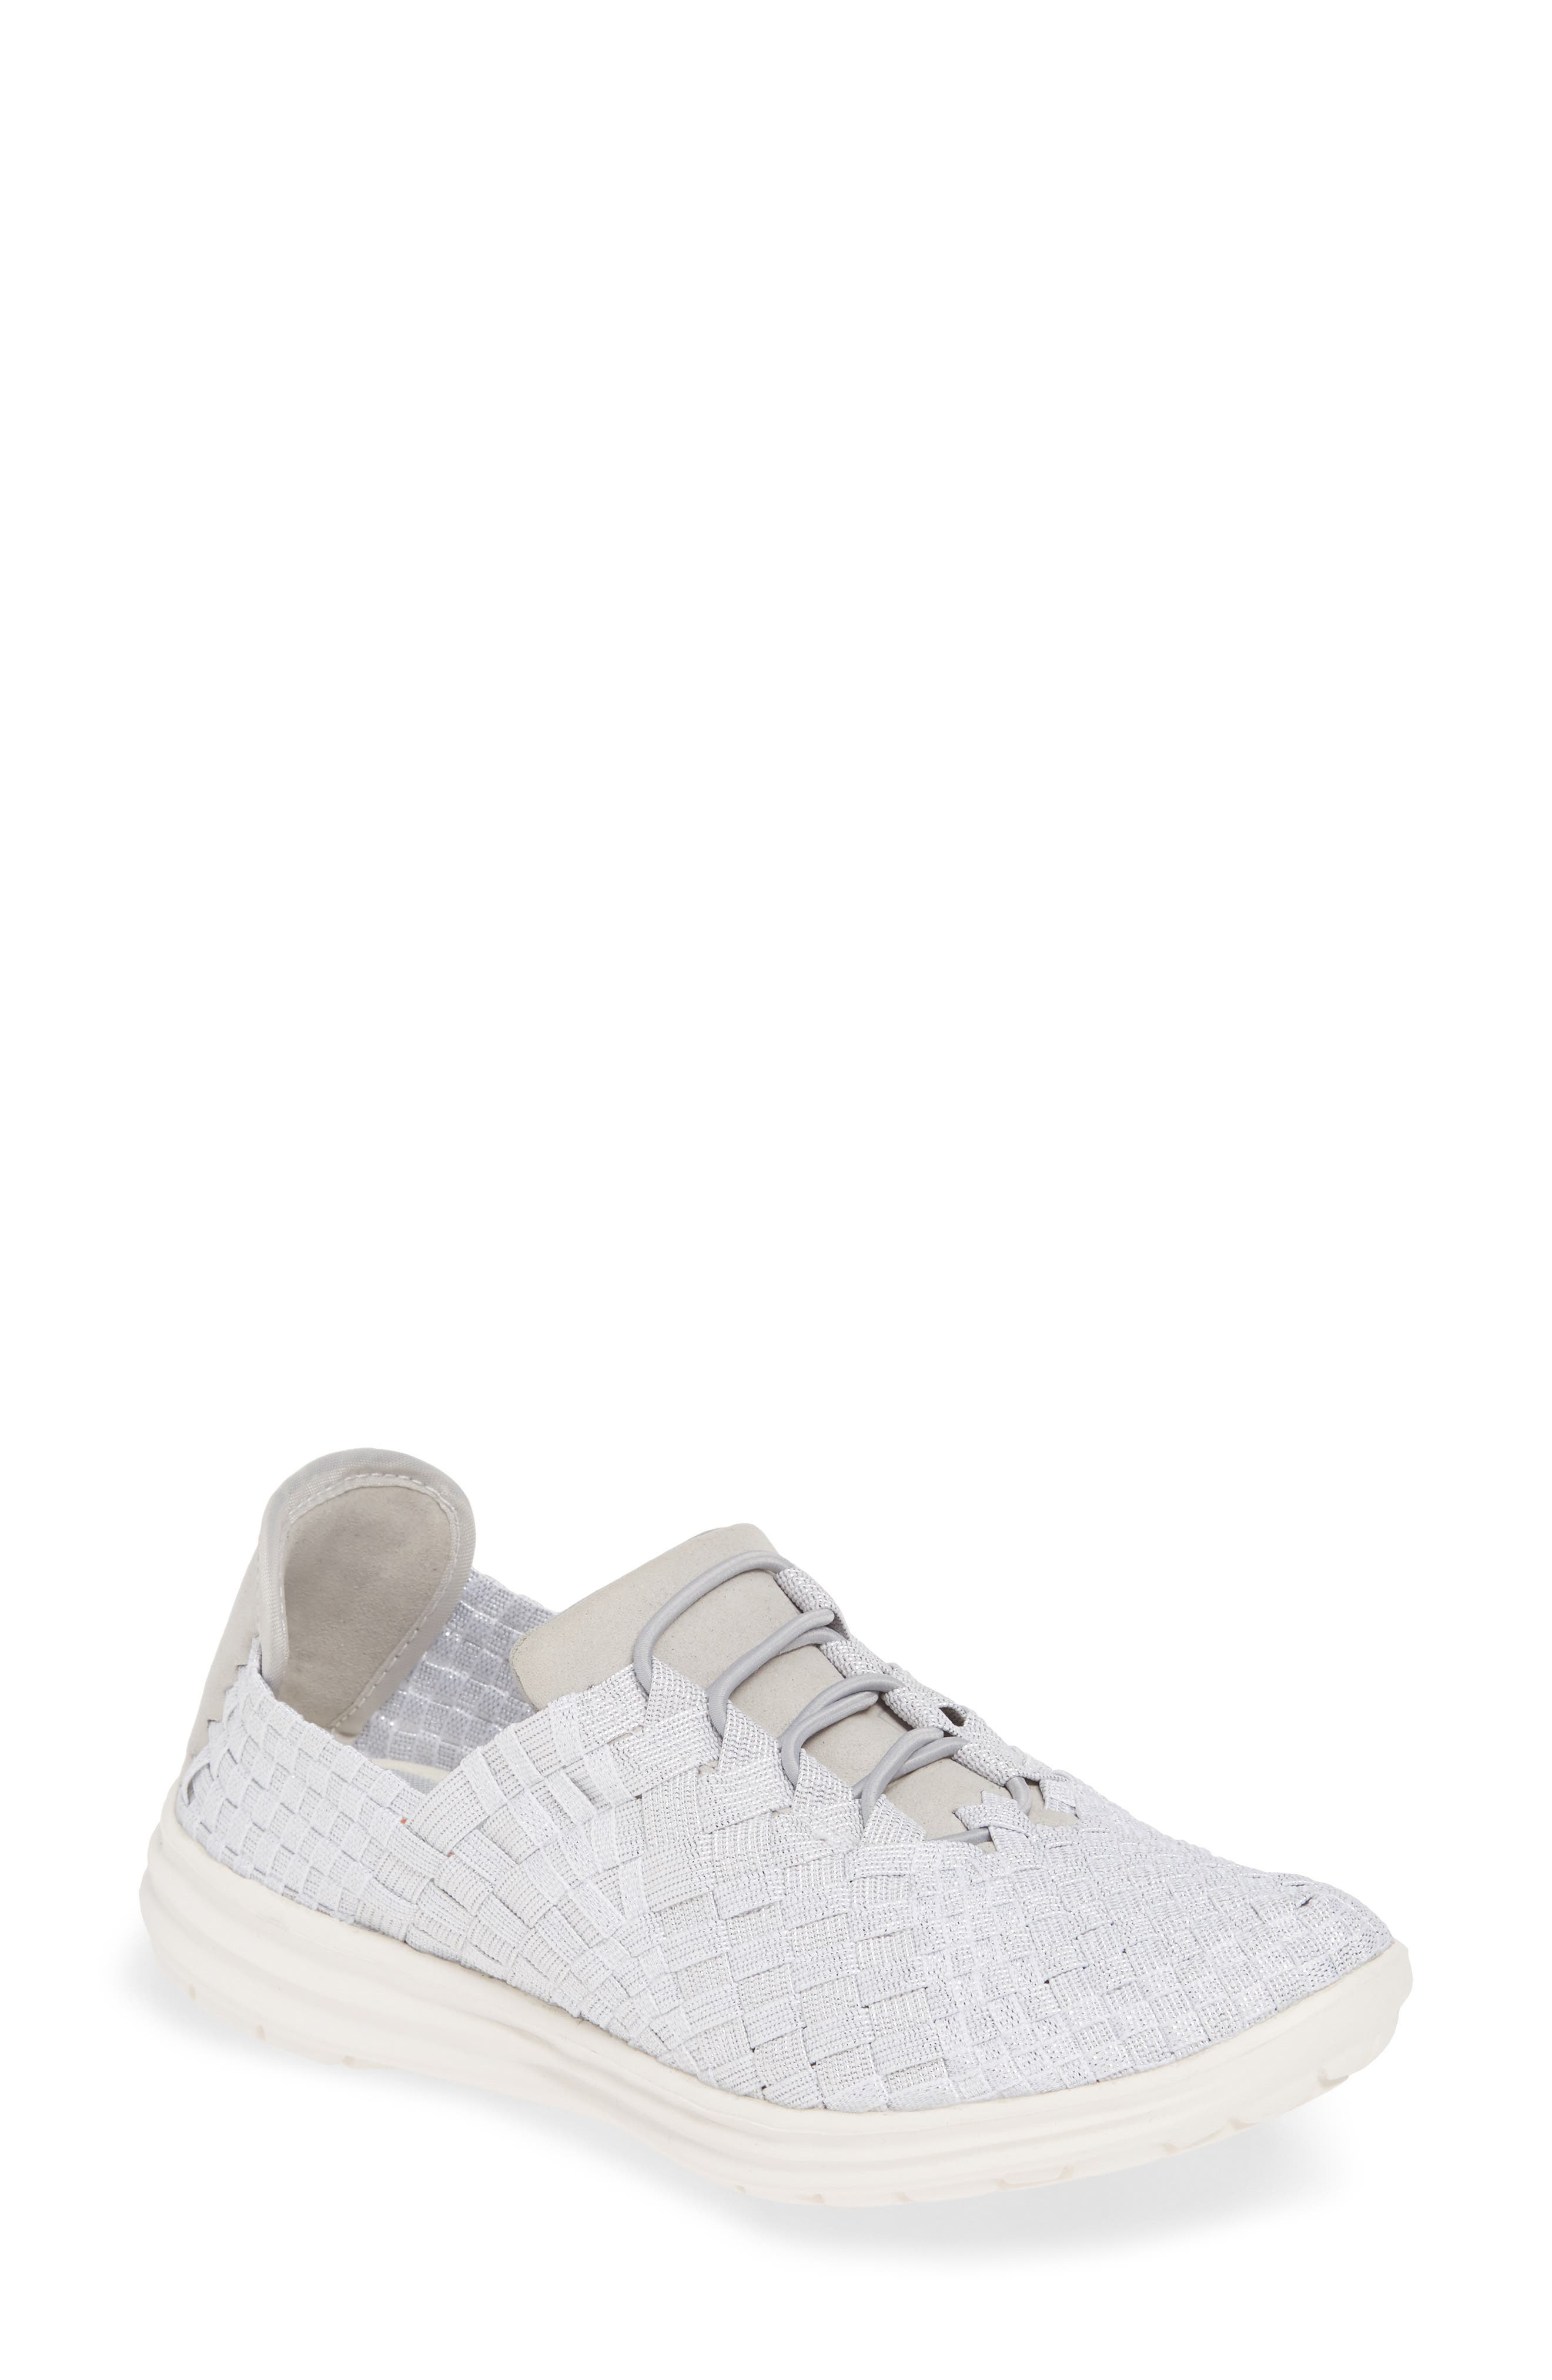 'Victoria' Woven Elastic Sneaker